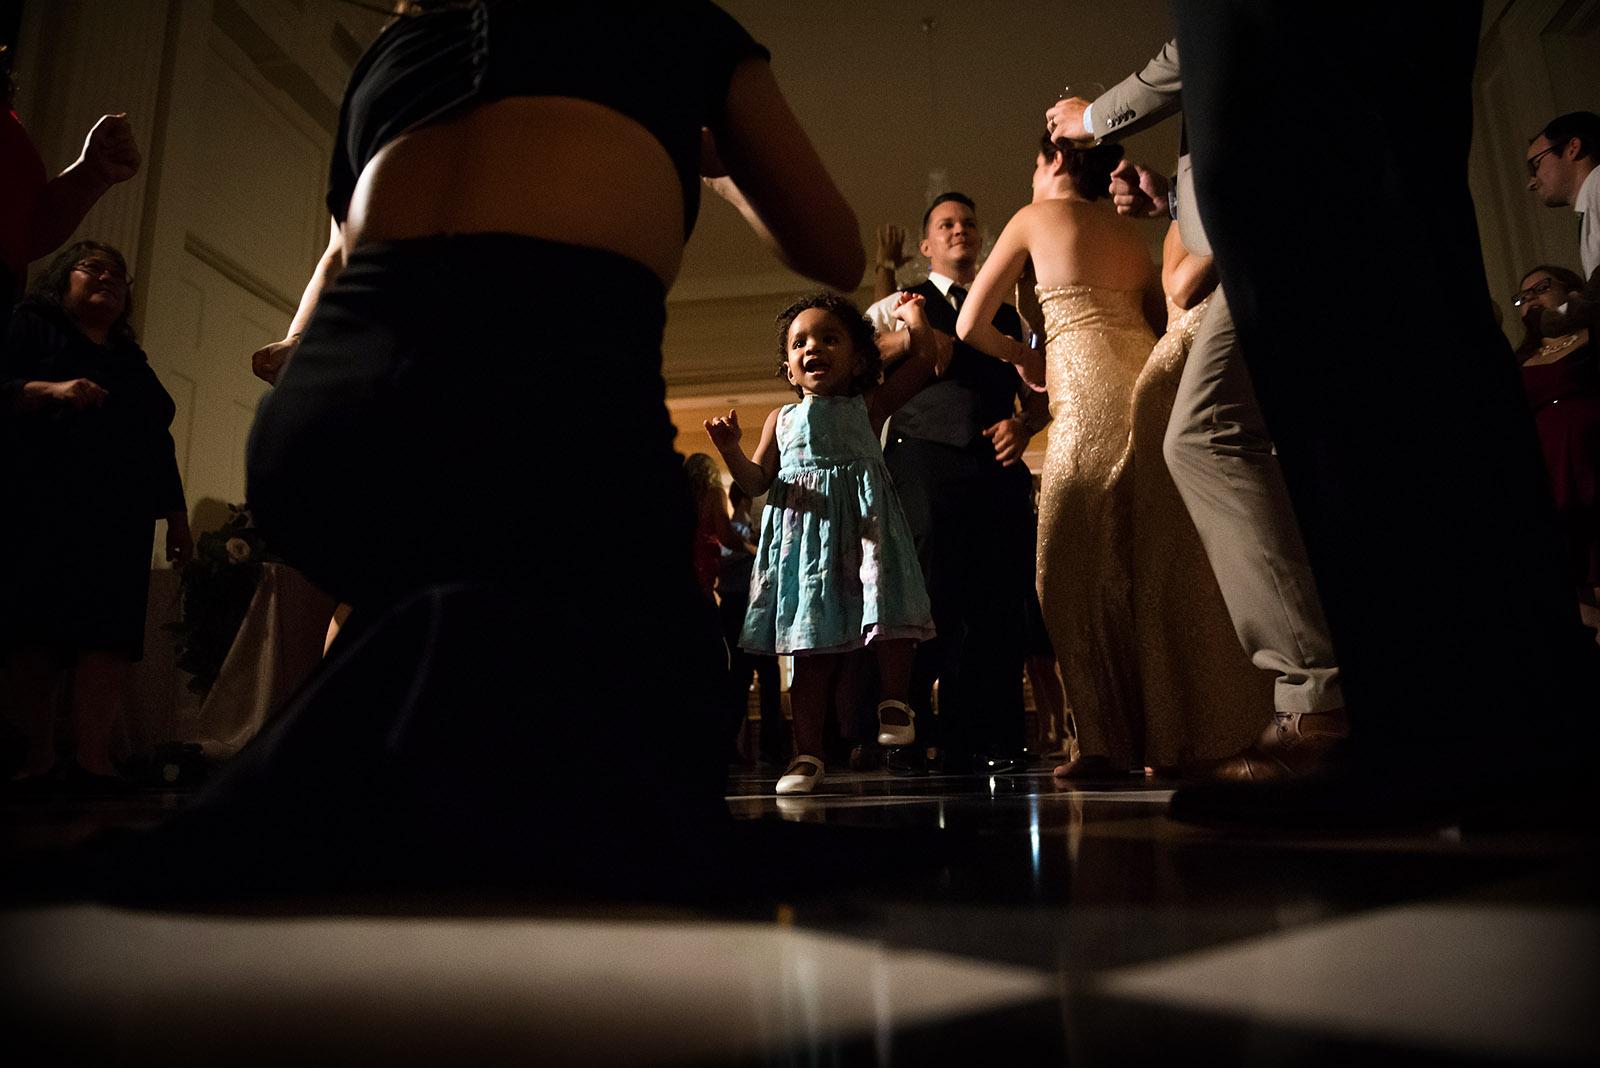 Tiny Girl Dancing Wedding Reception